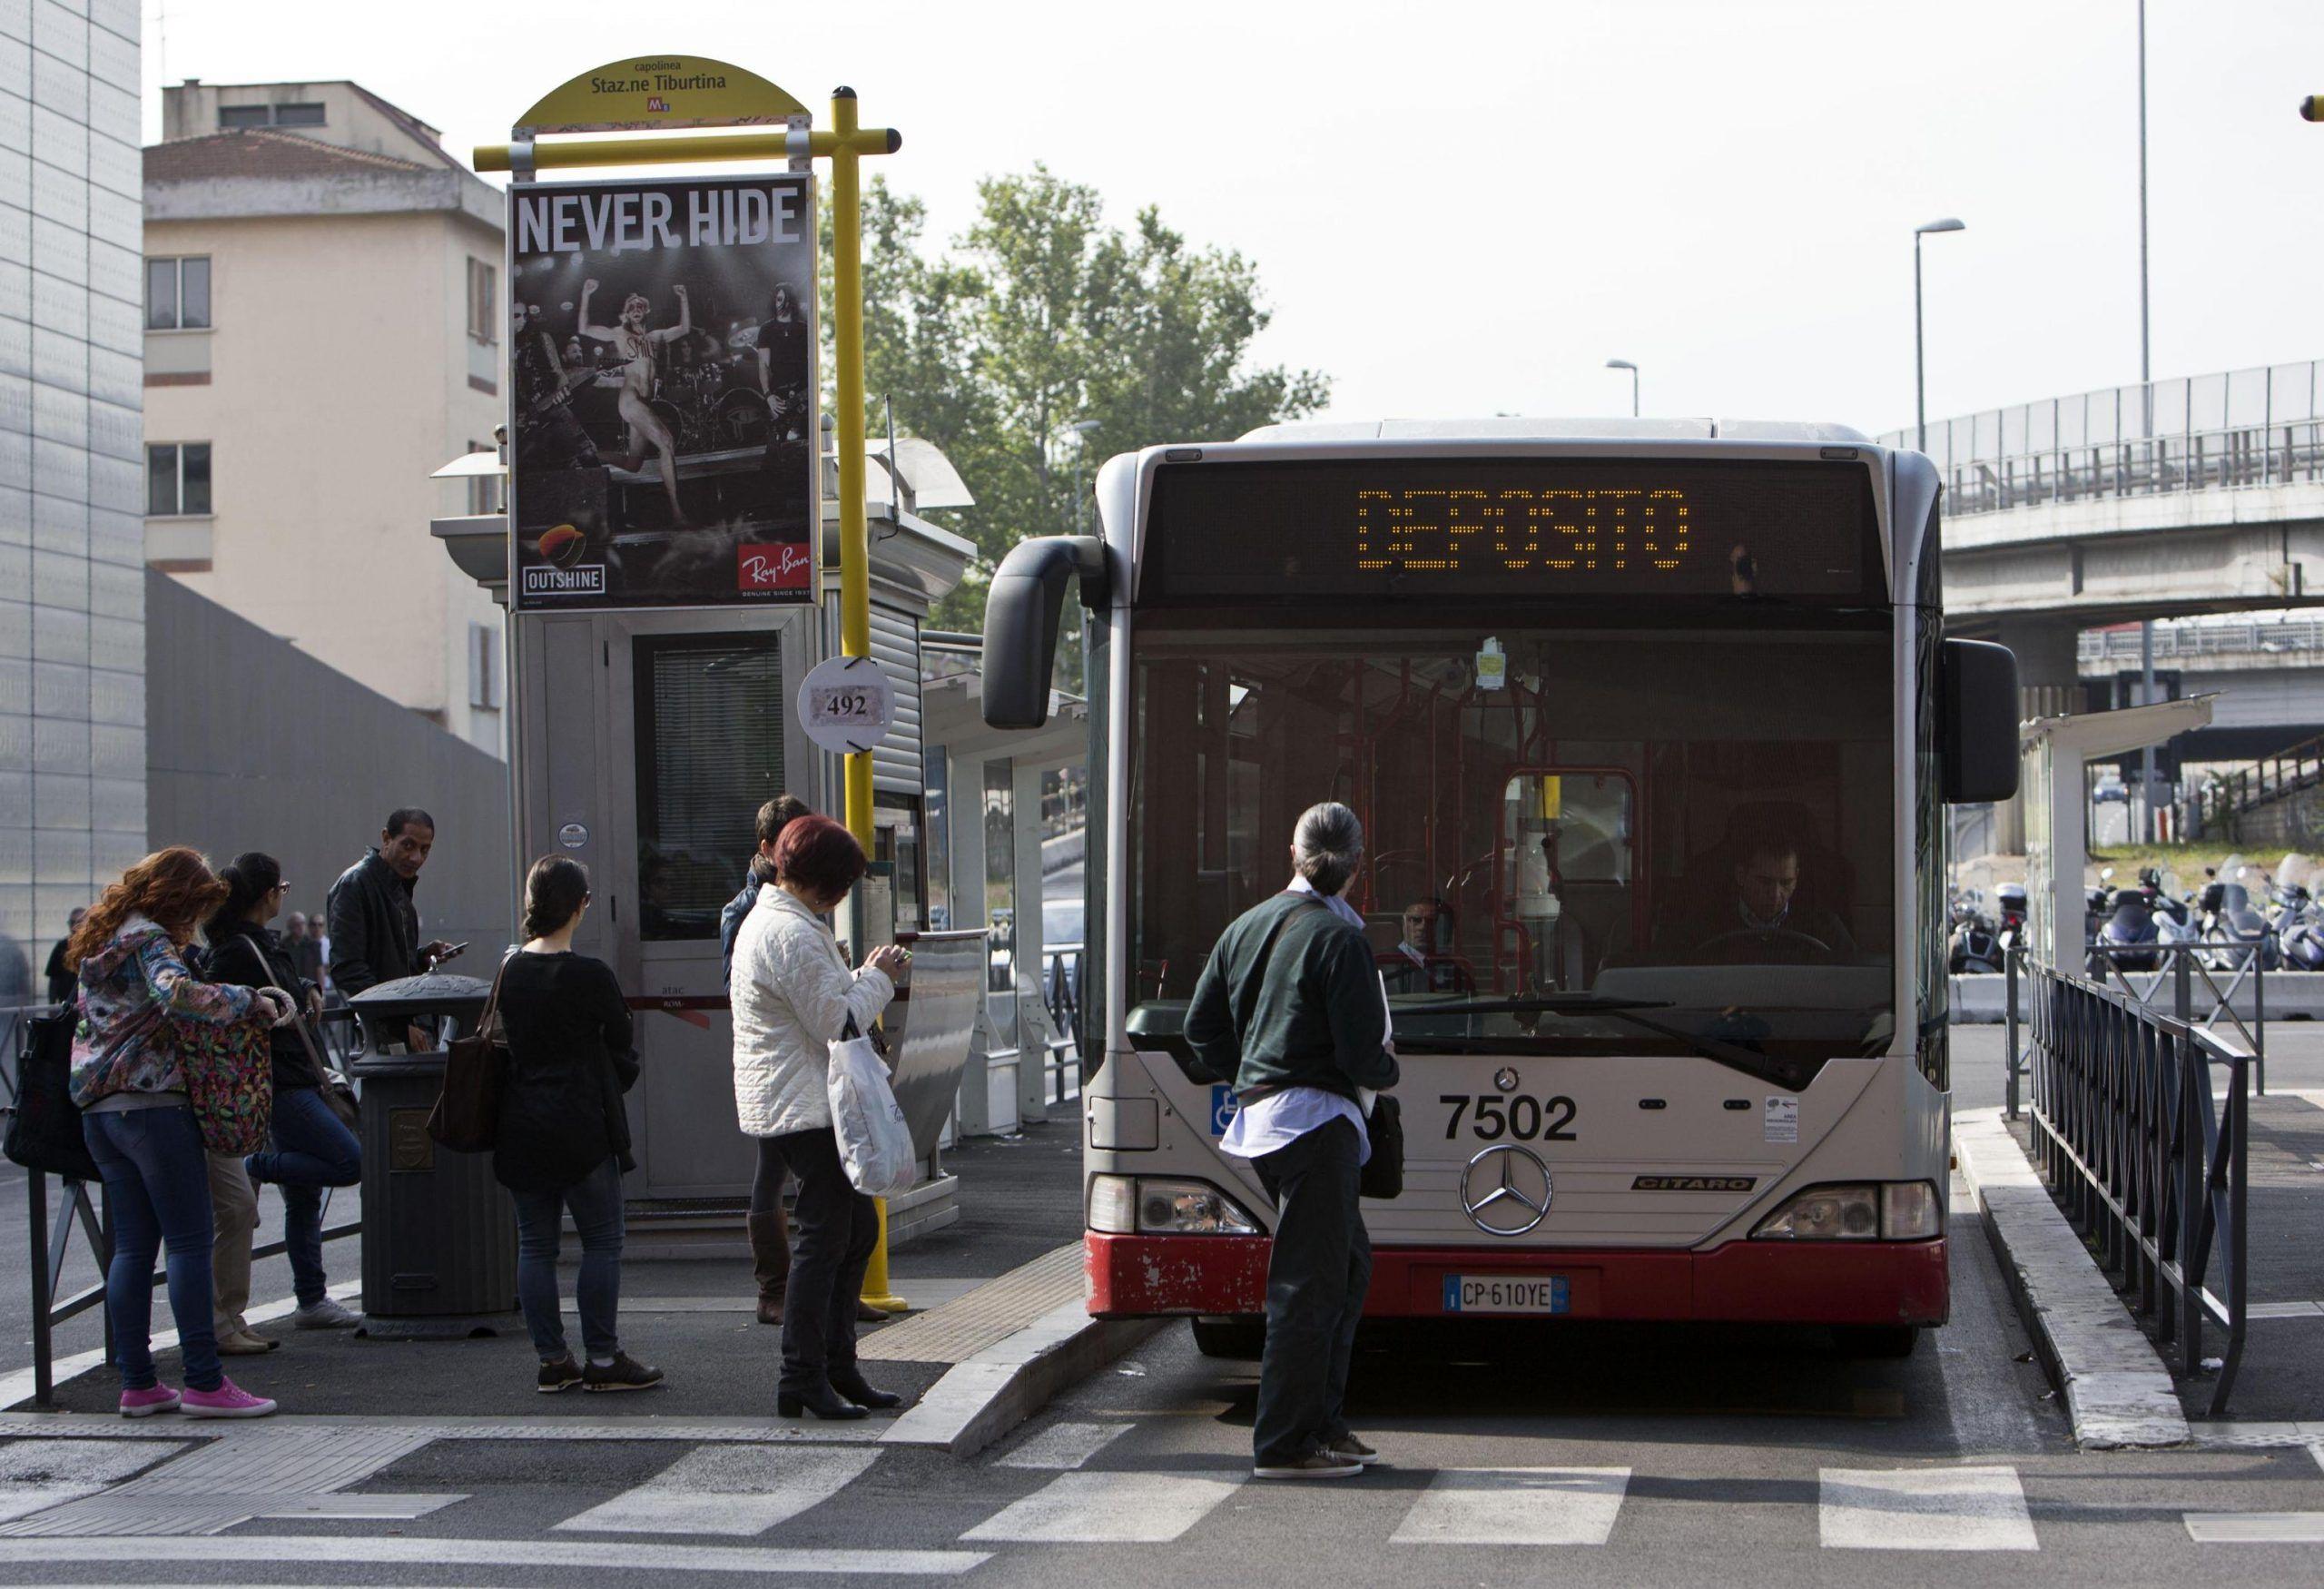 TRASPORTI ATAC ROMA SCIOPERO METRO BUS